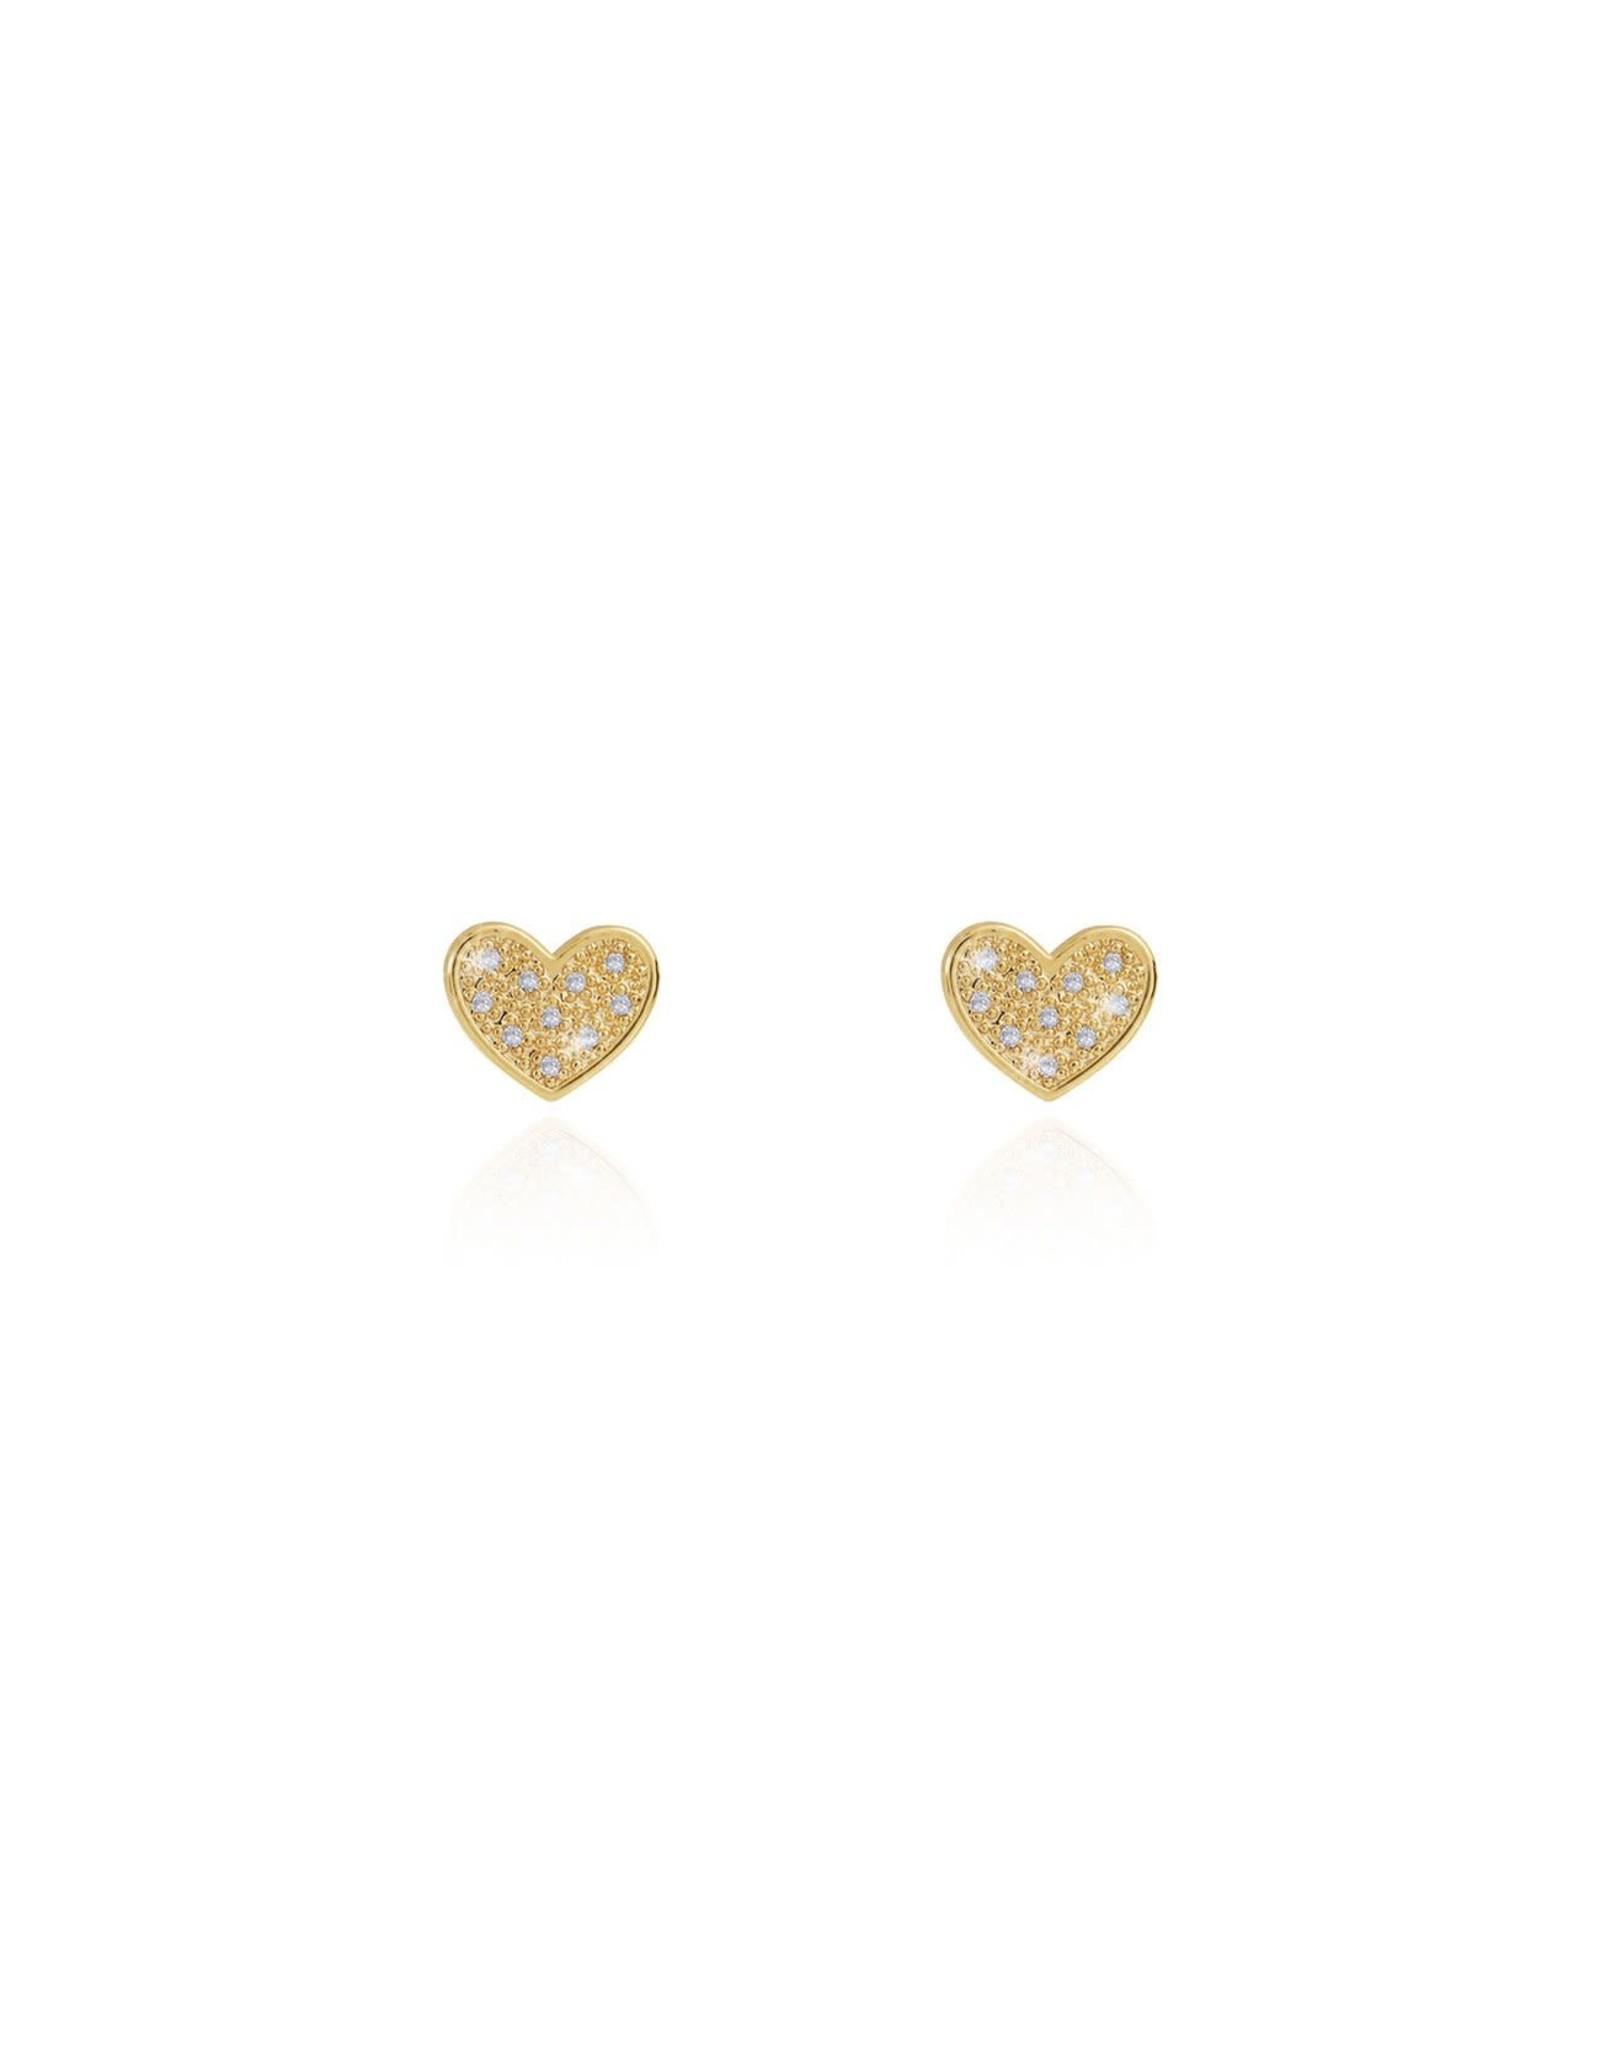 Joma Jewellery Treasure the Little Things - Live Love Sparkle